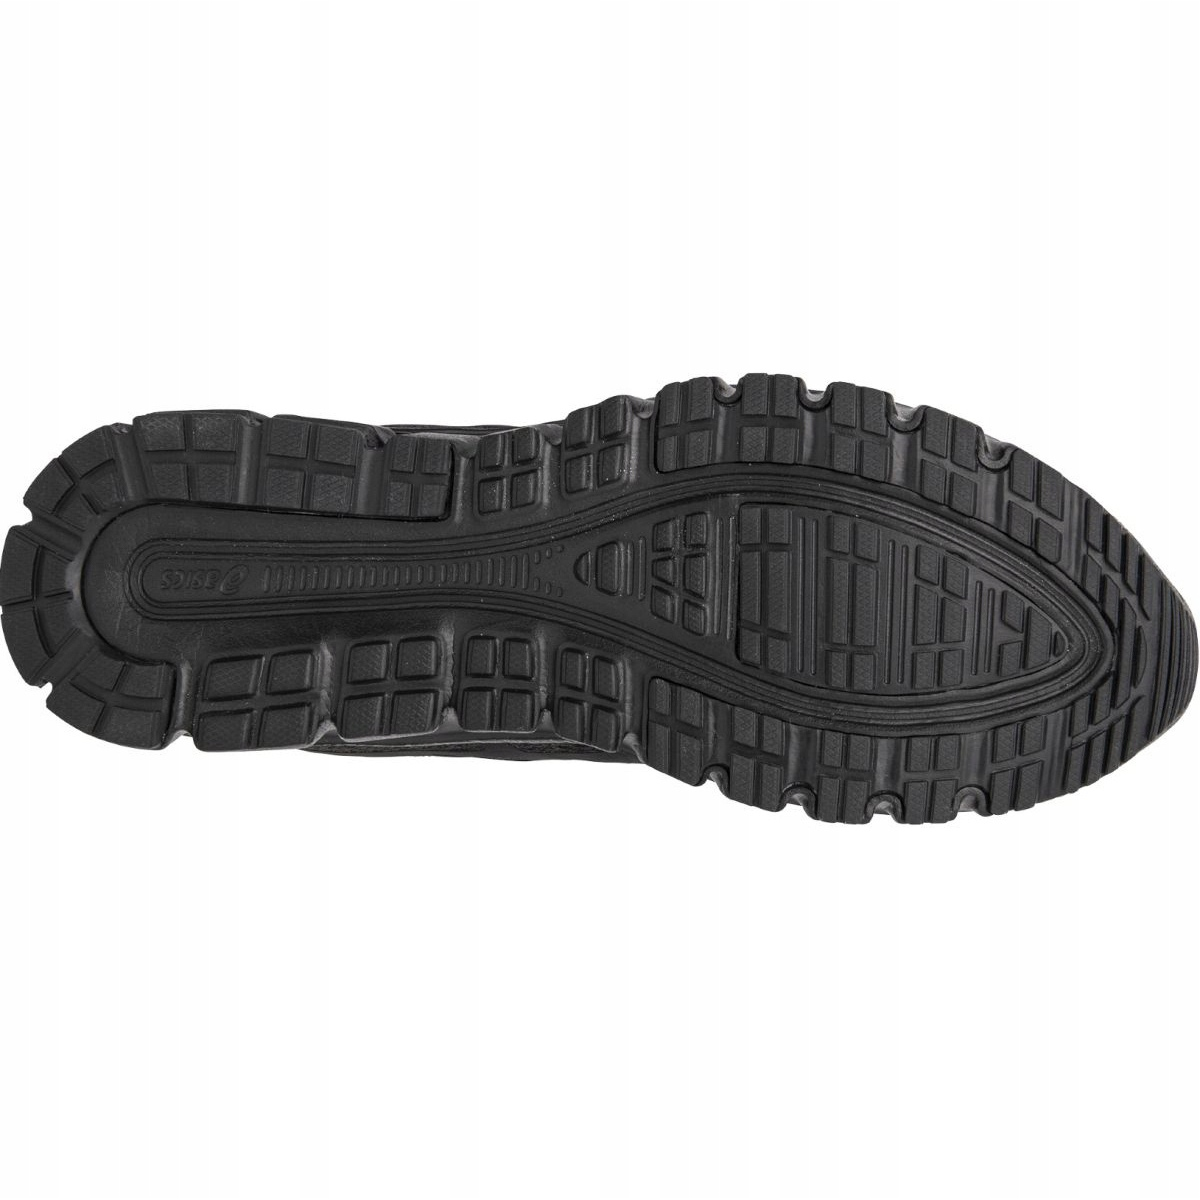 oficina postal capturar Anguila  Asics Gel-Quantum 90 M 1021A123-001 running shoes black - ButyModne.pl